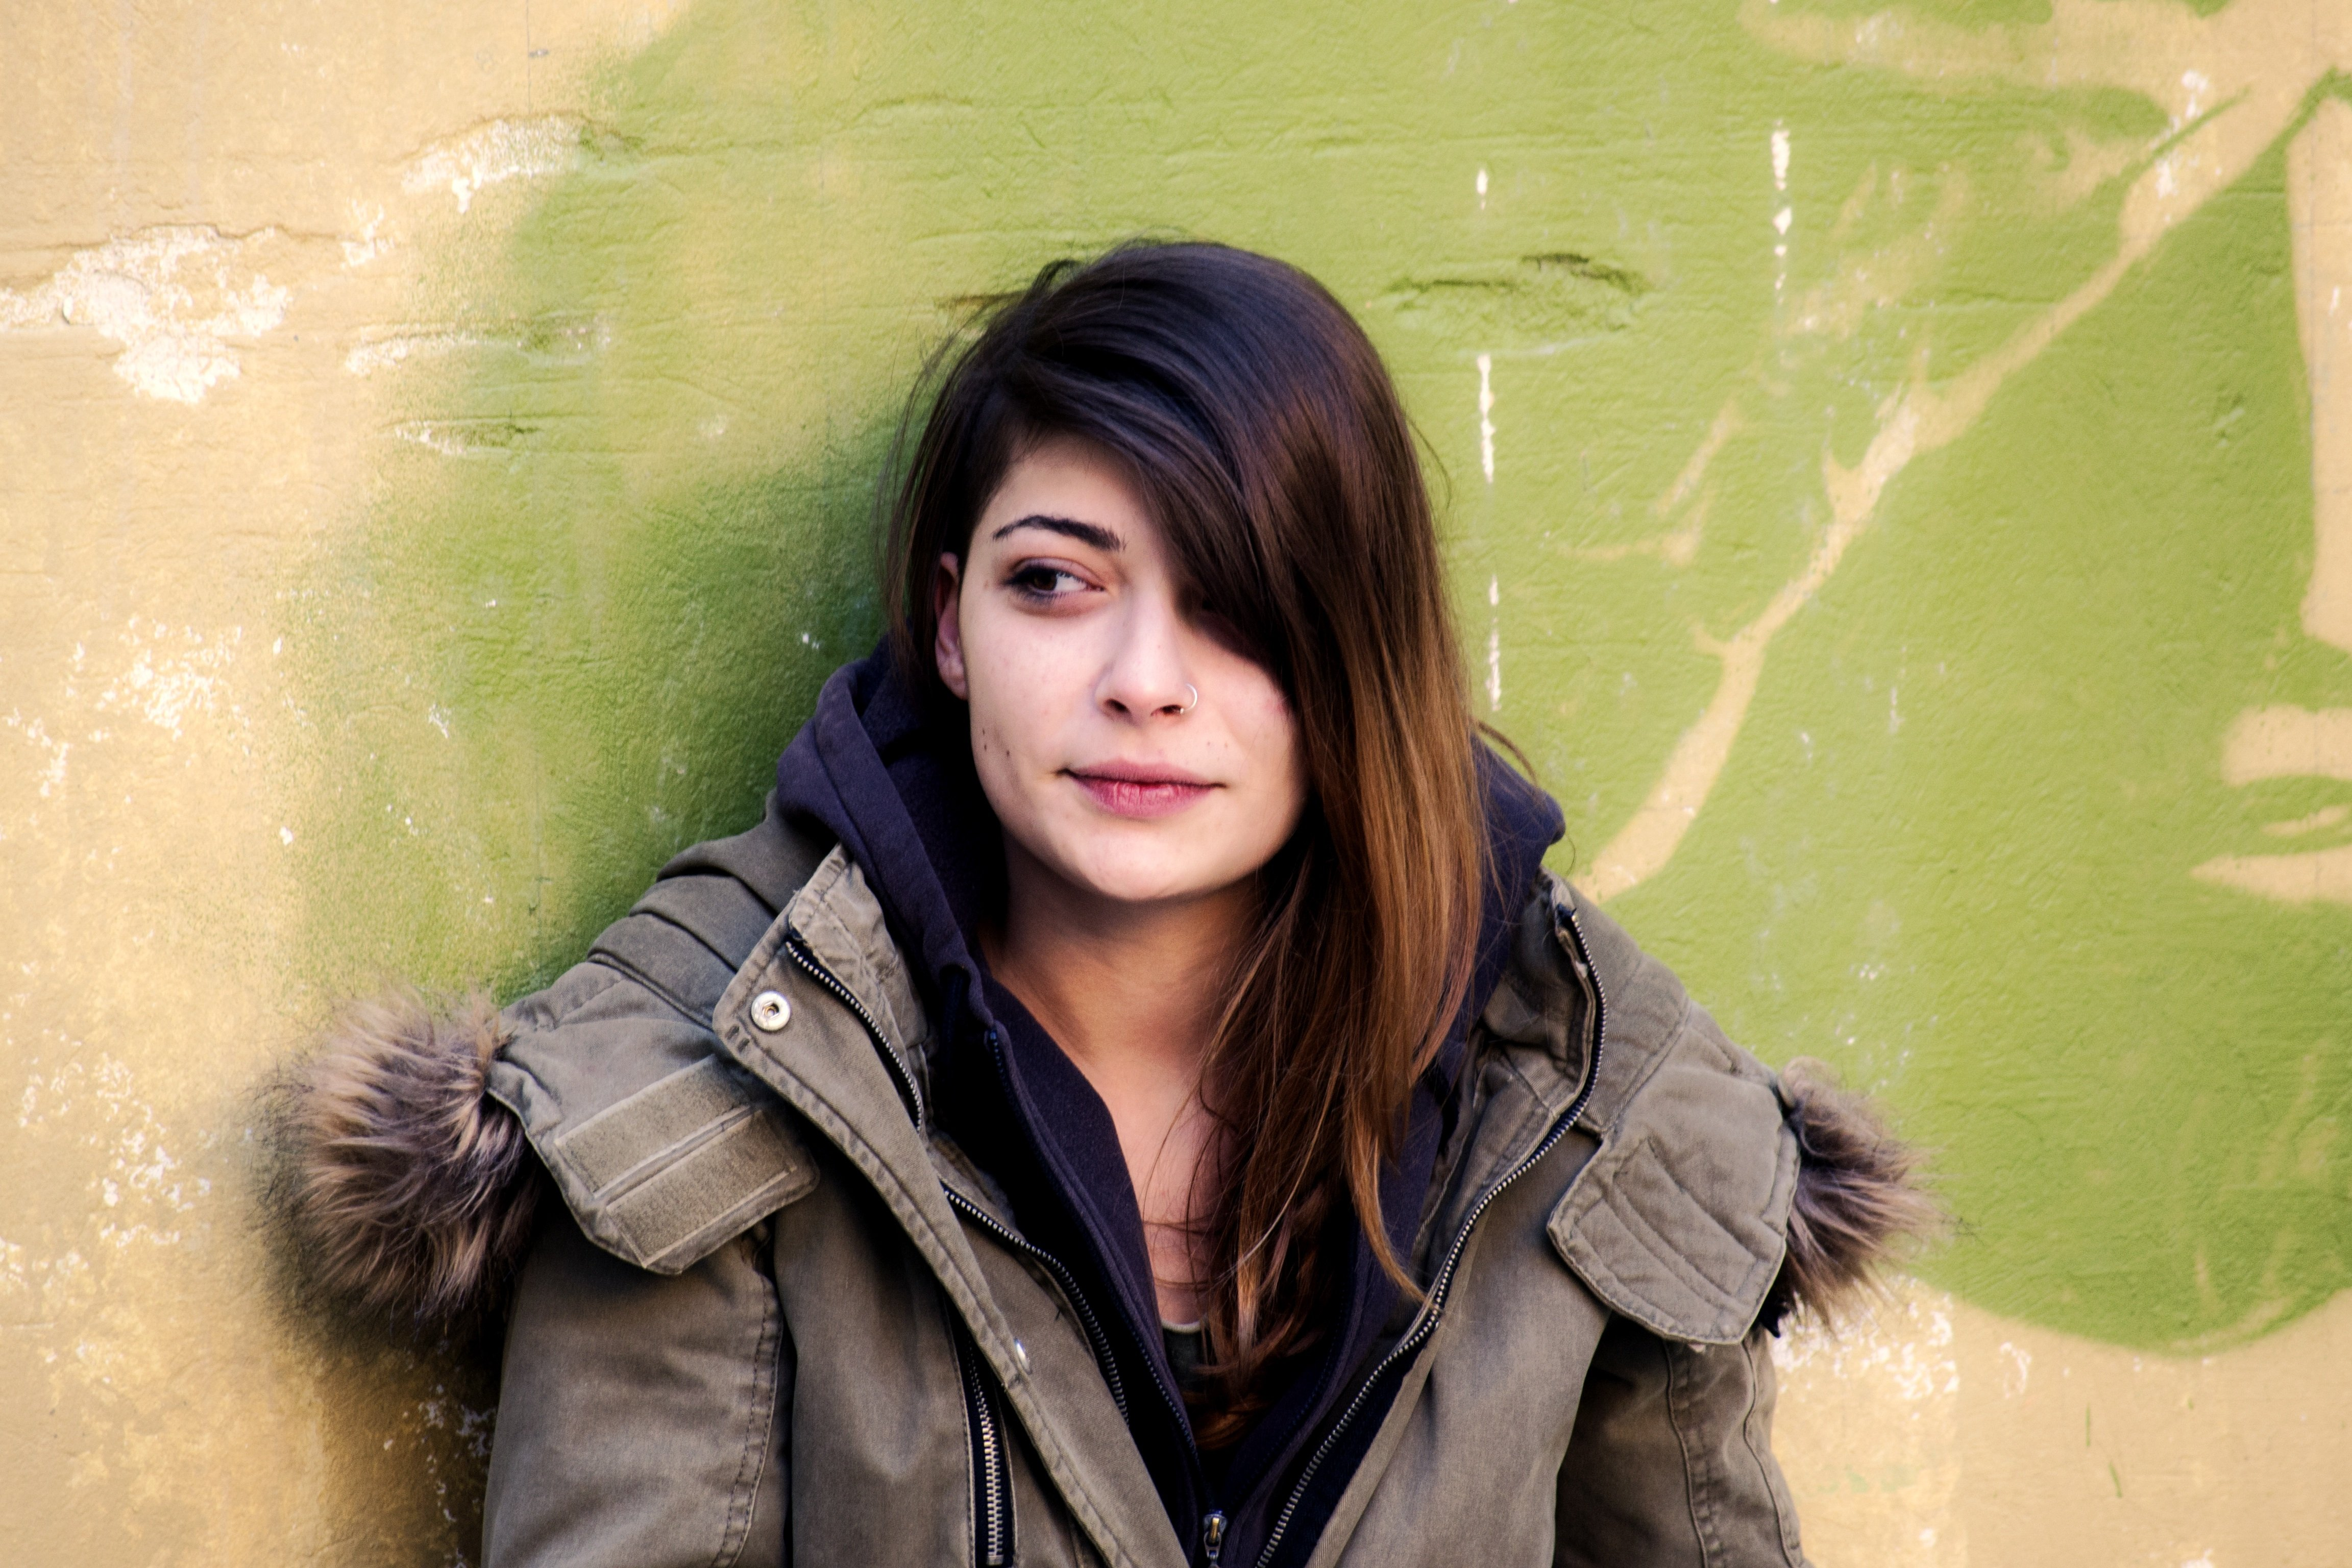 Young woman - photo Pixabay